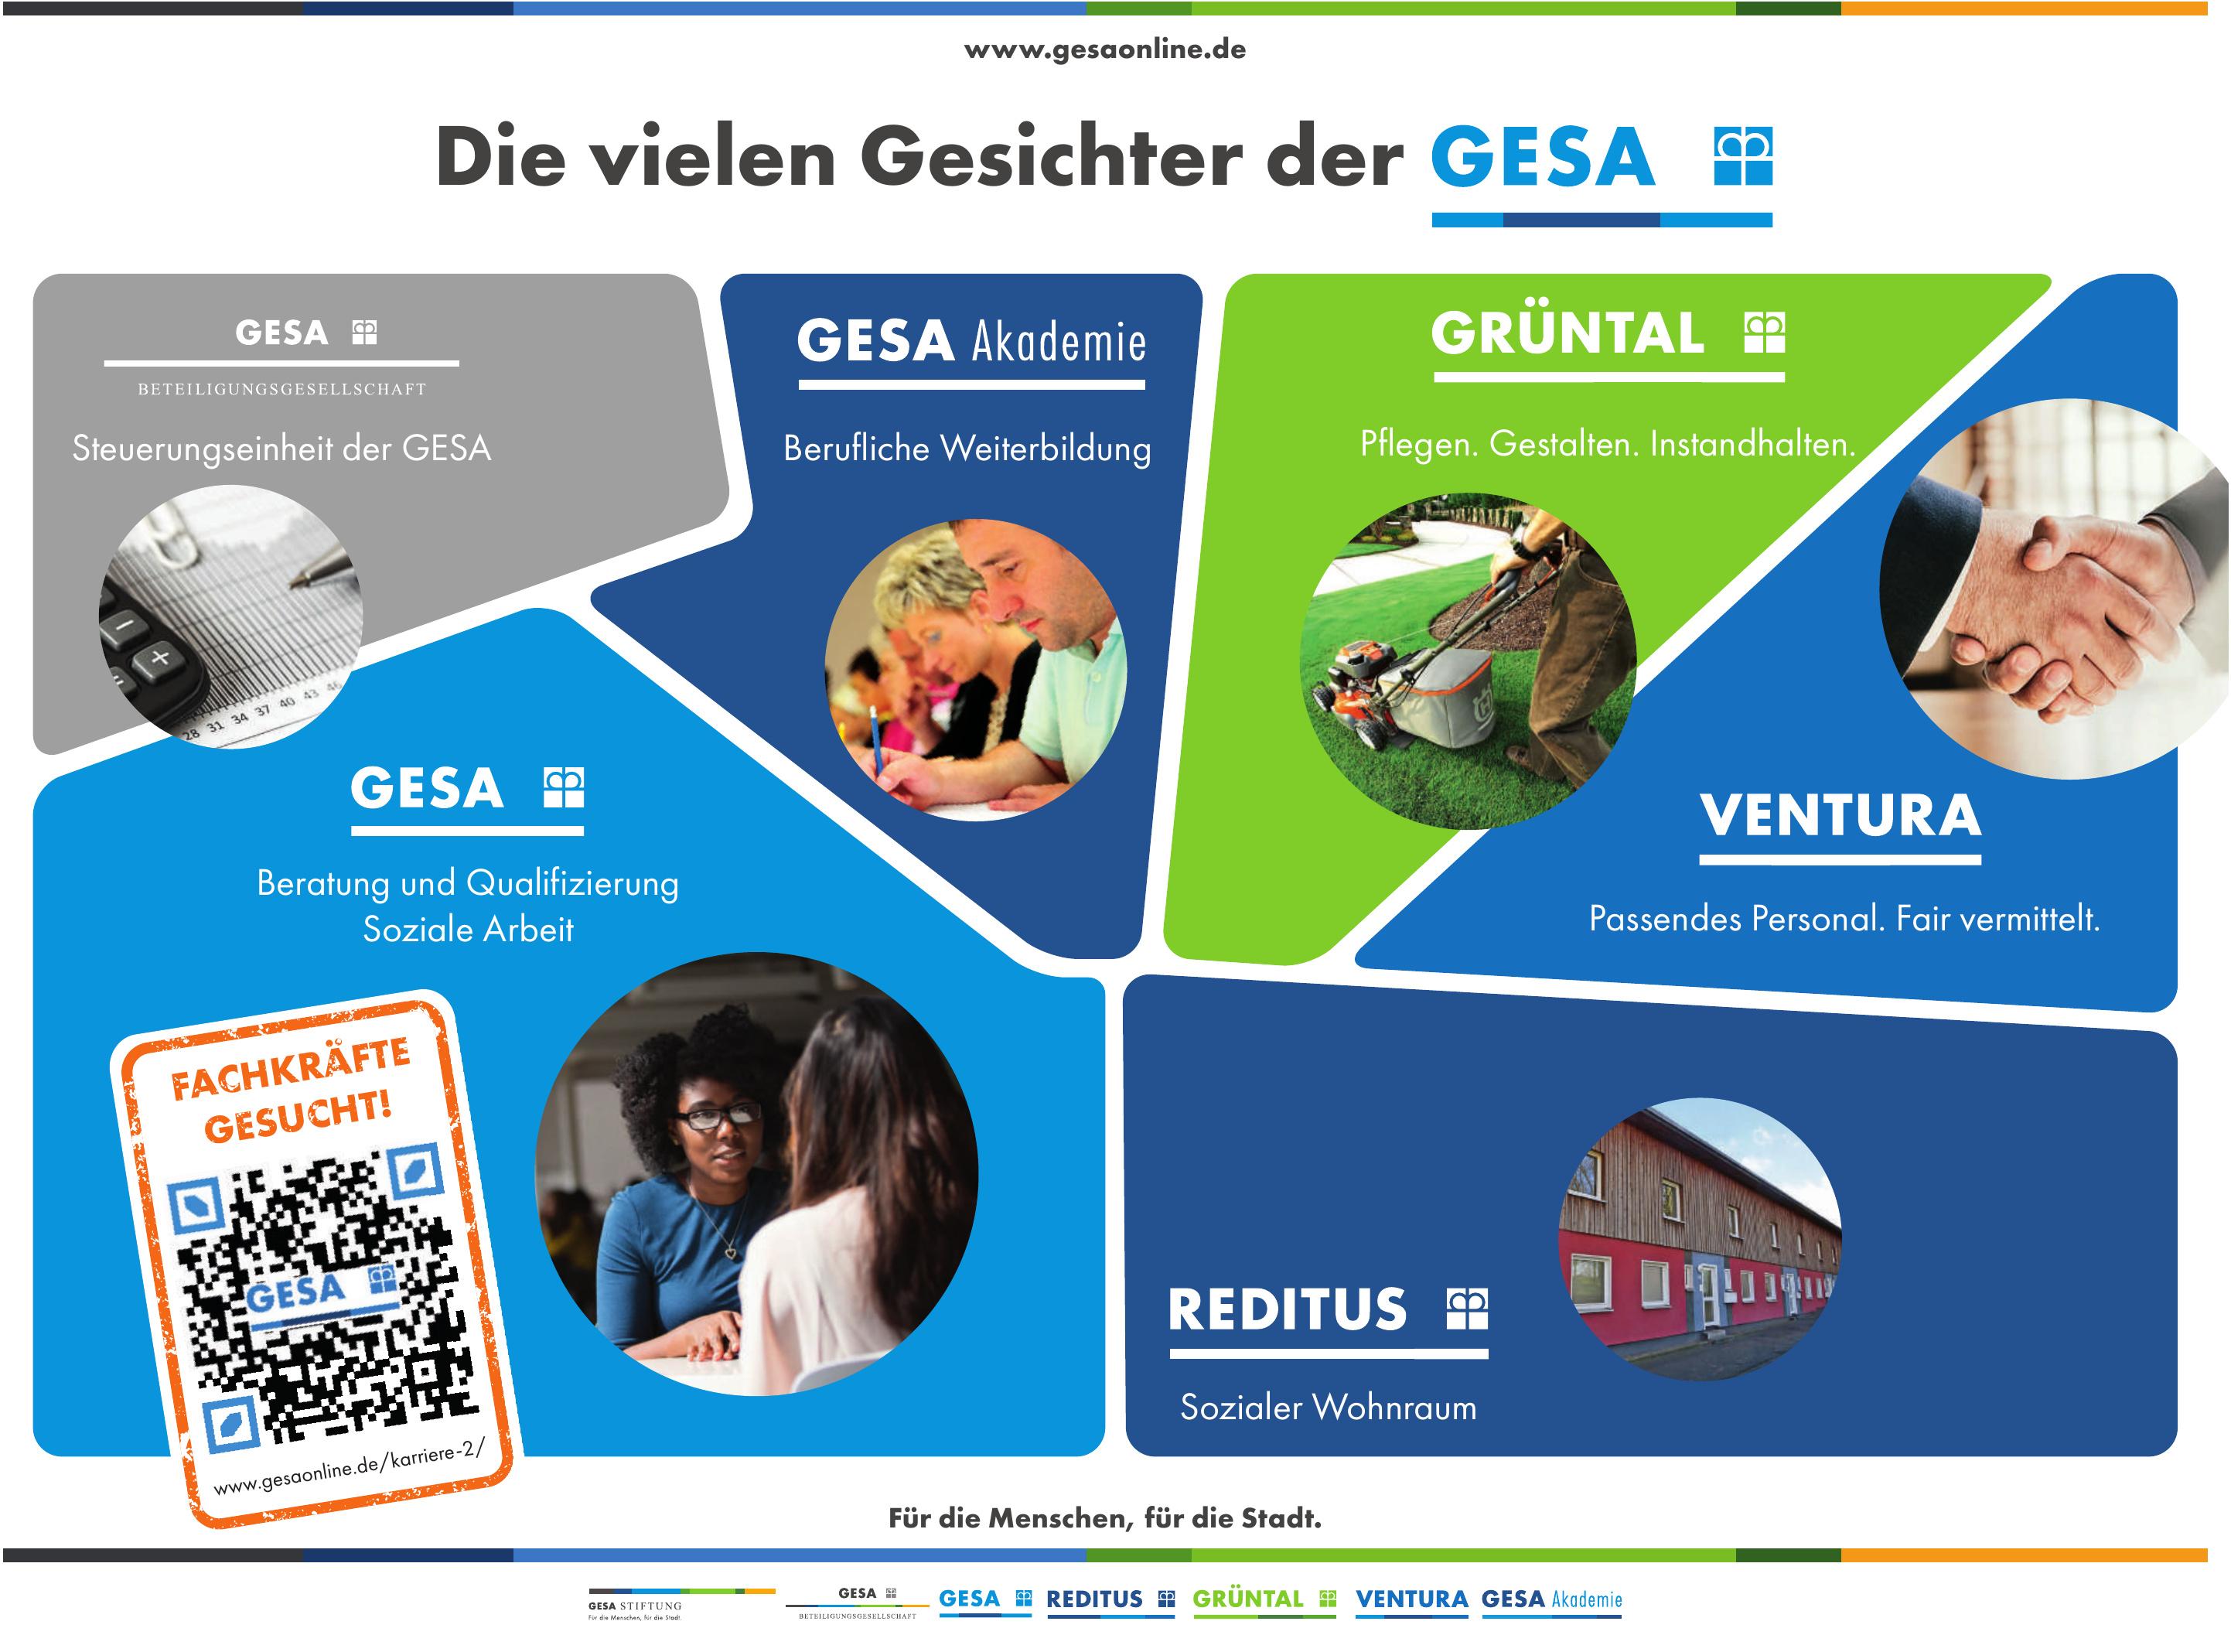 GESA Stiftung